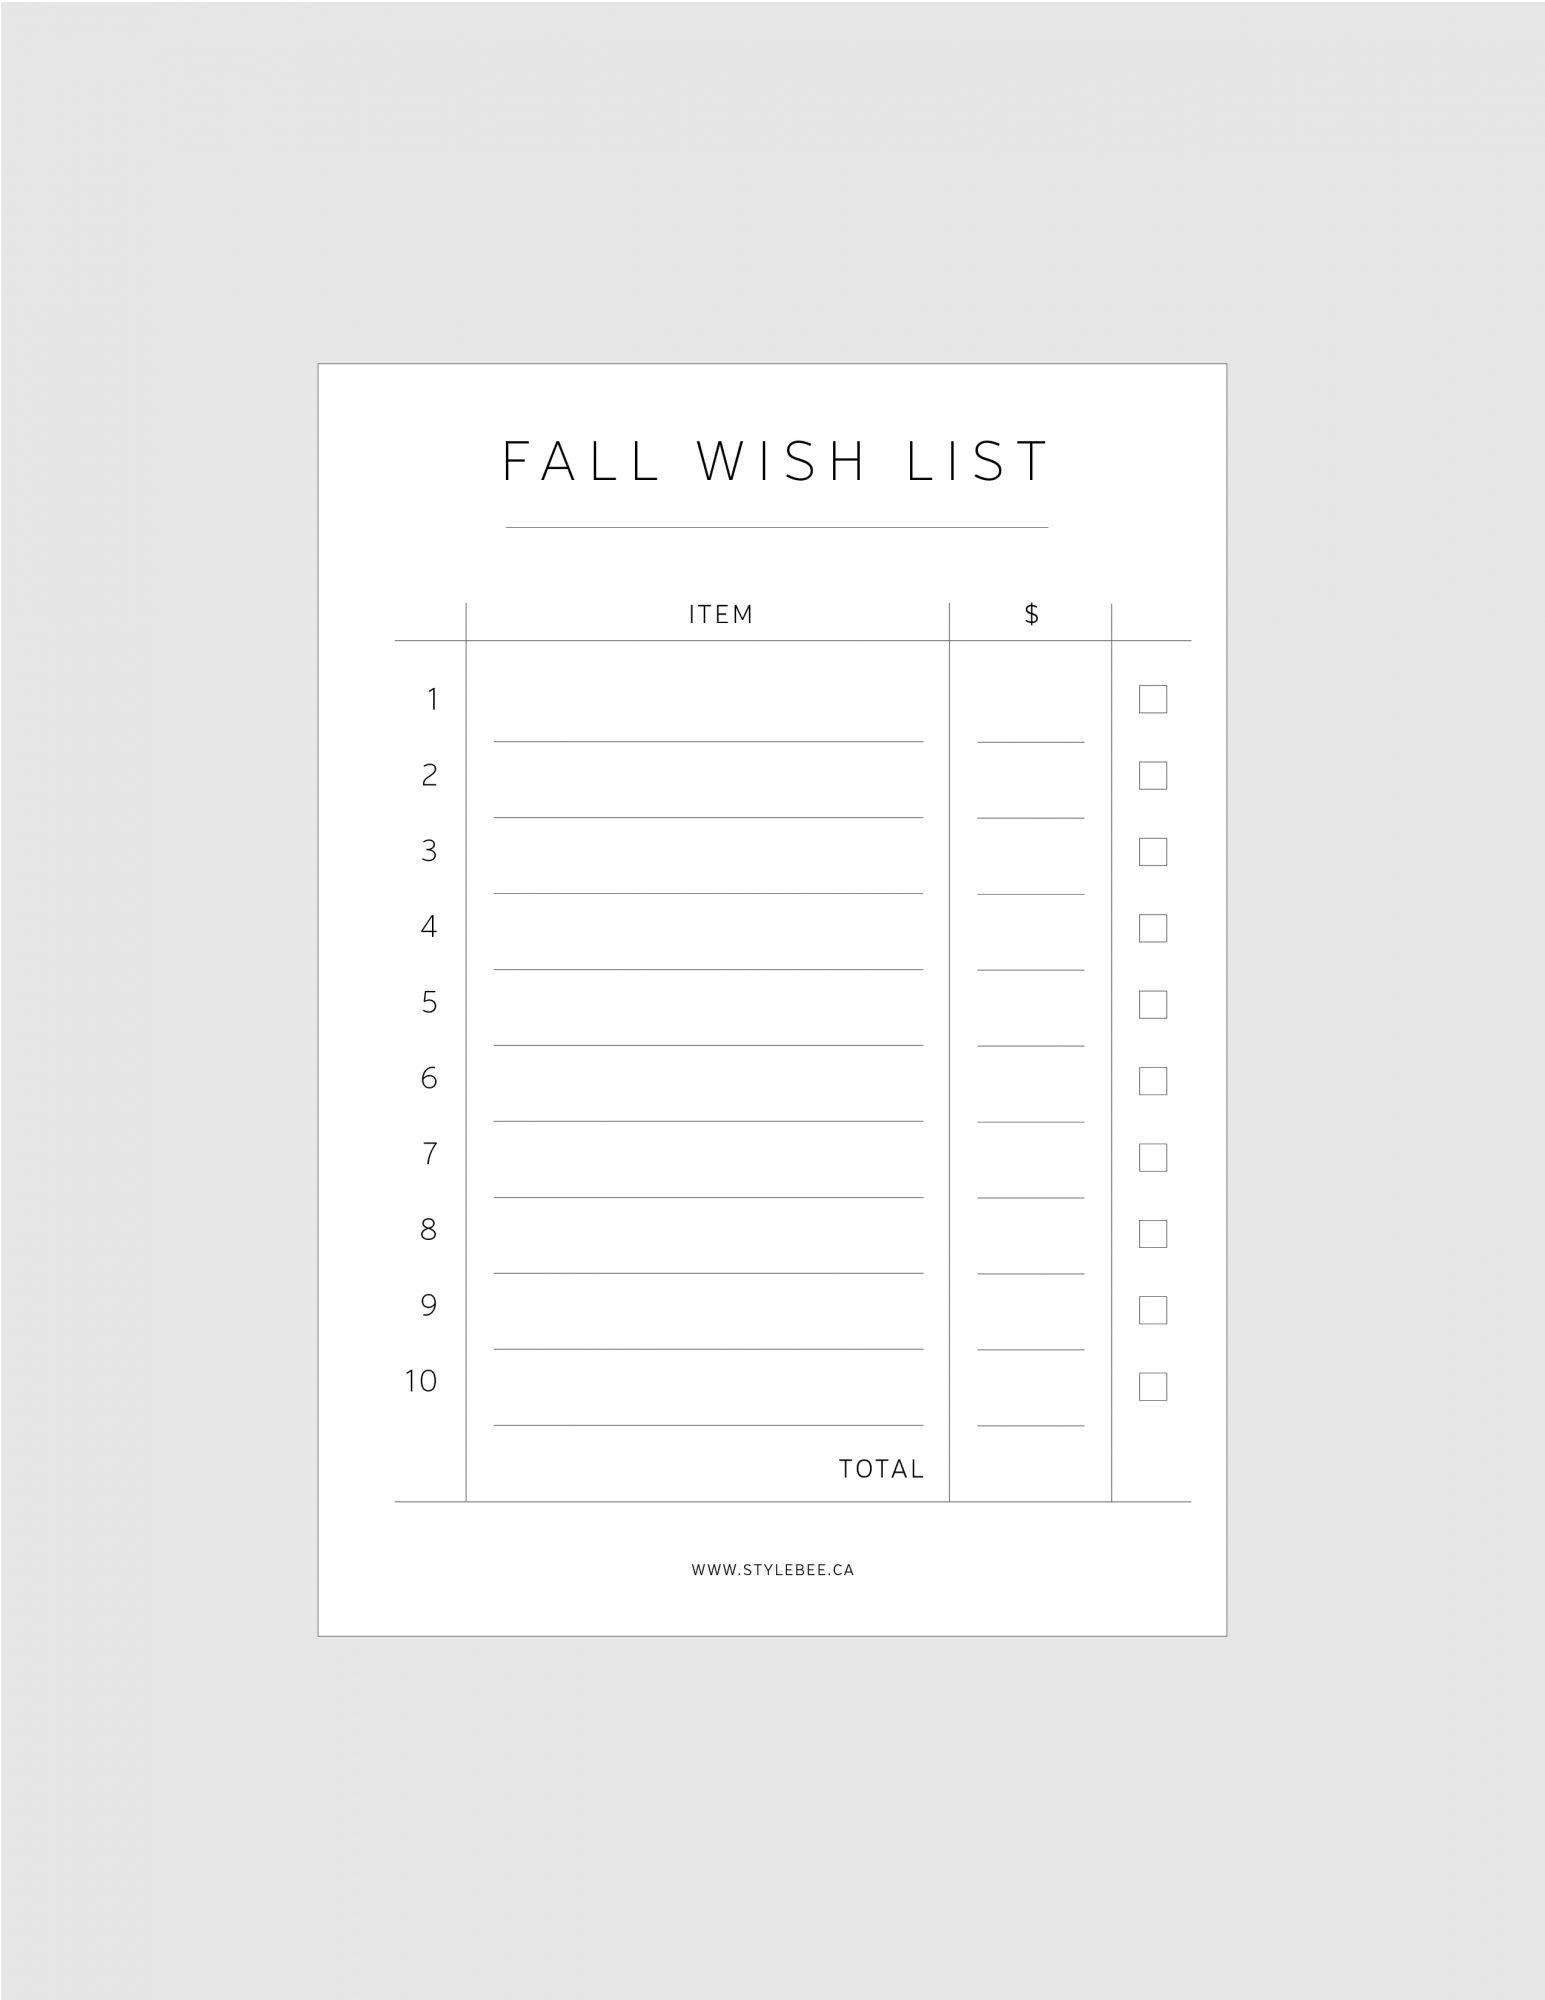 StyleBee_FALLWishlist_Printable